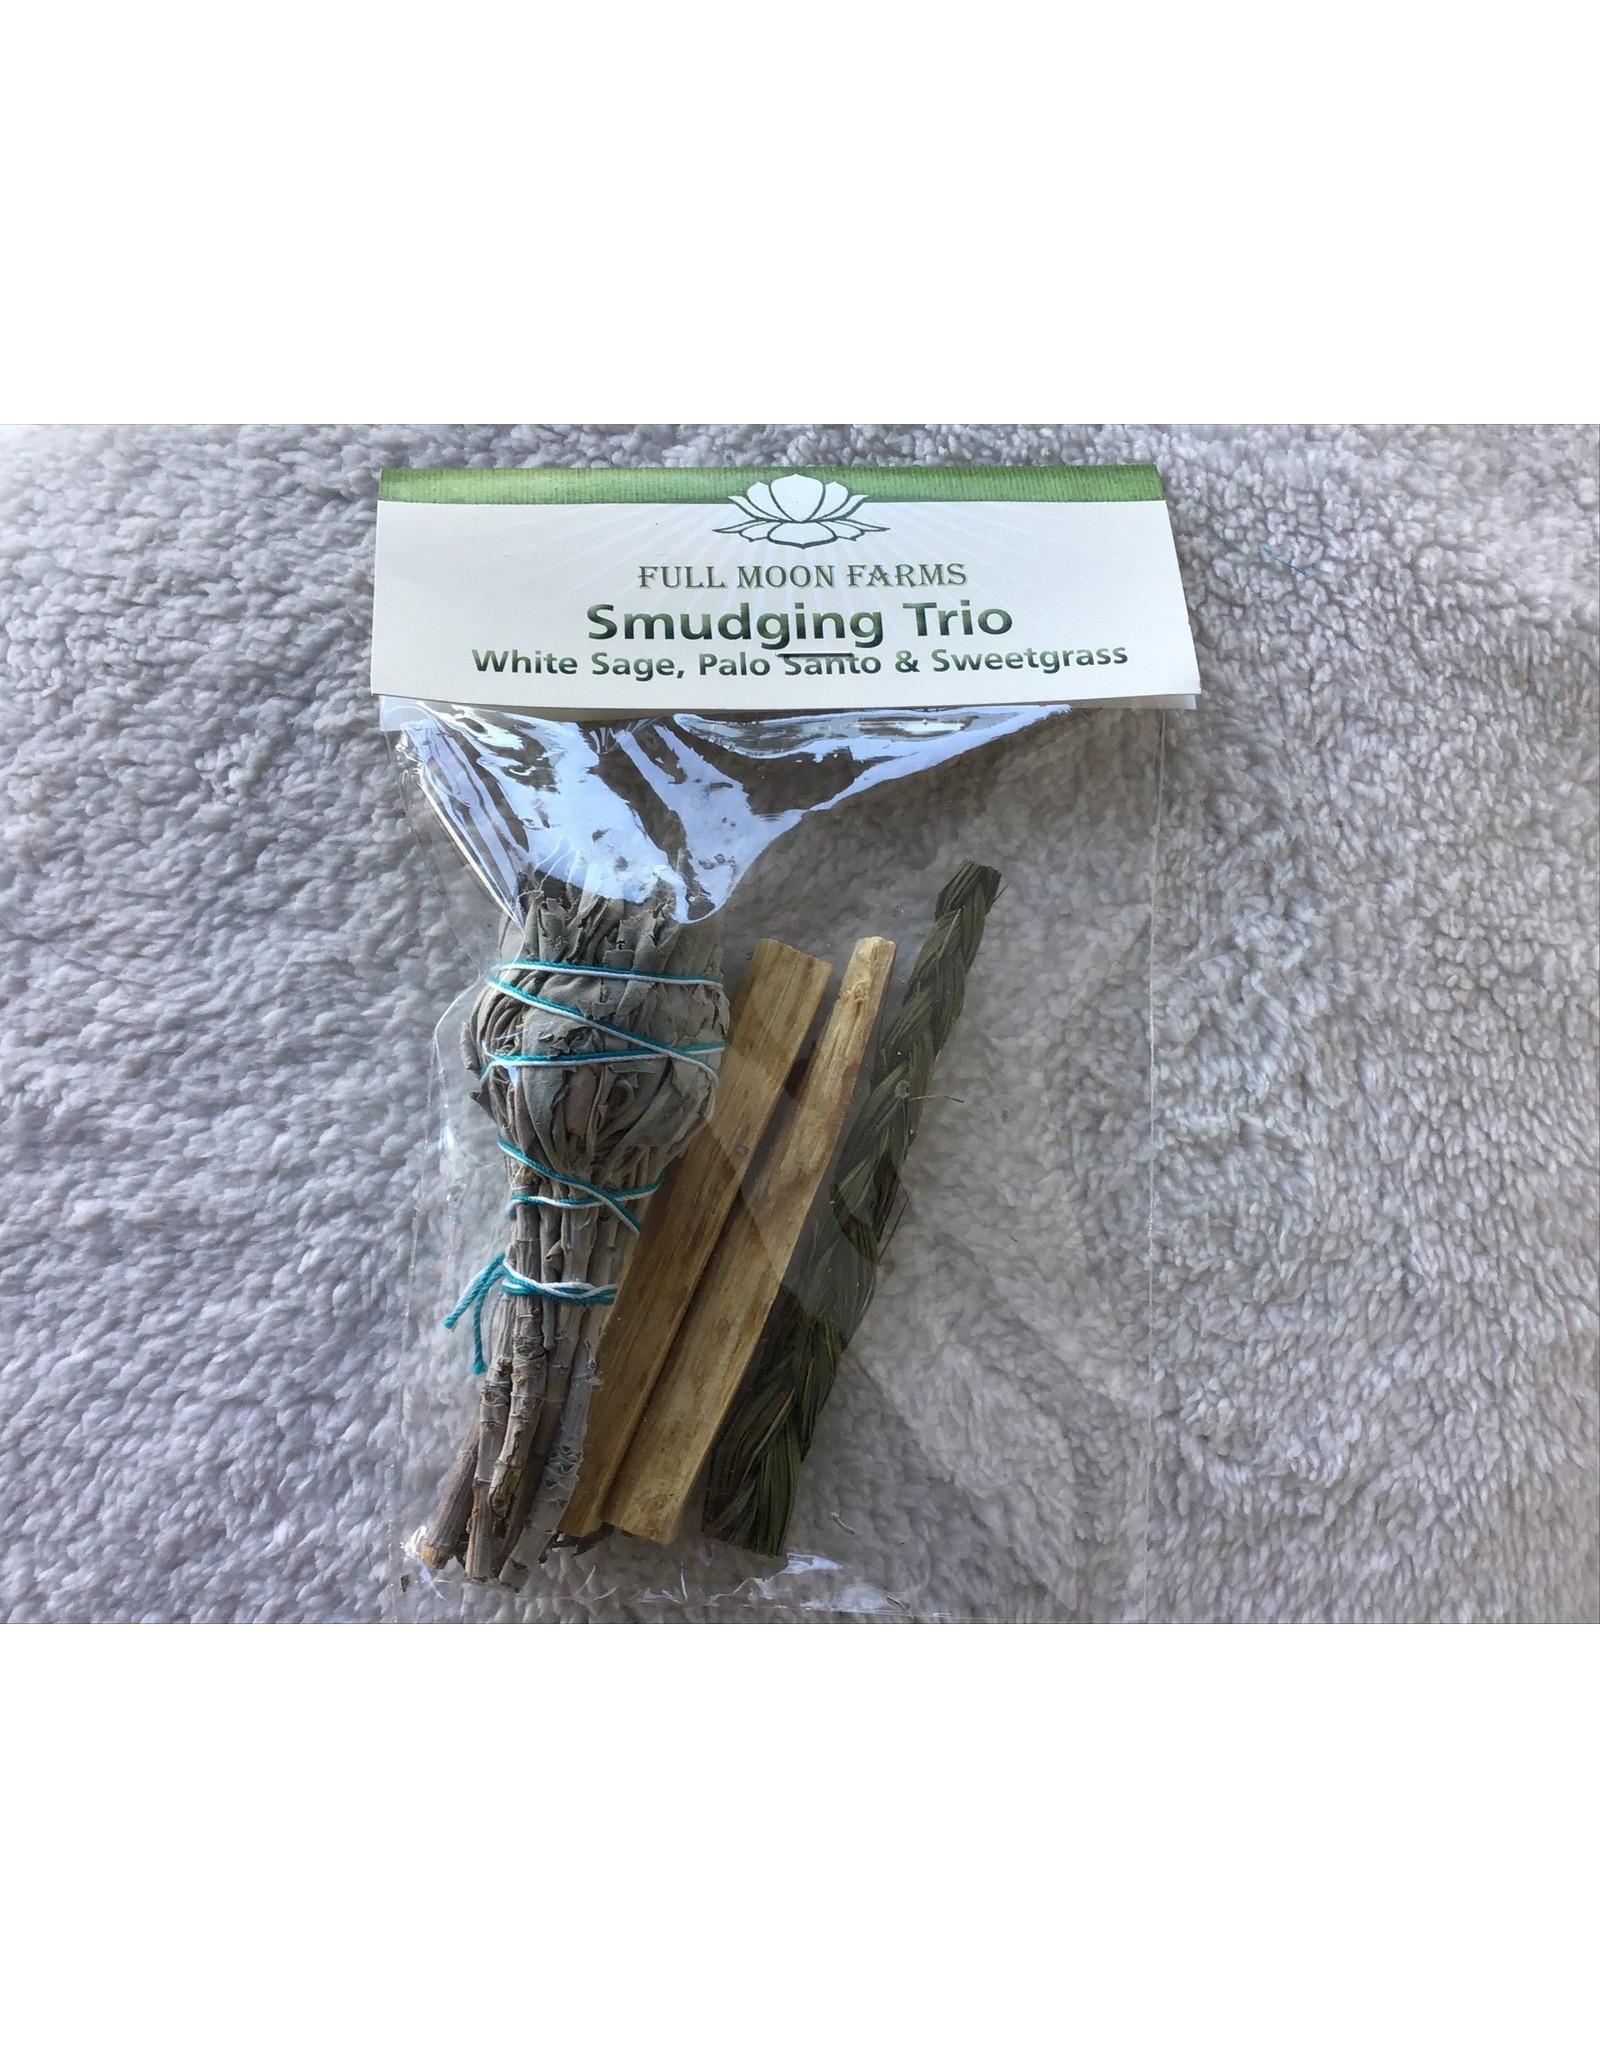 Full Moons Farms Smudging Trio | White Sage, Palo Santo & Sweetgrass